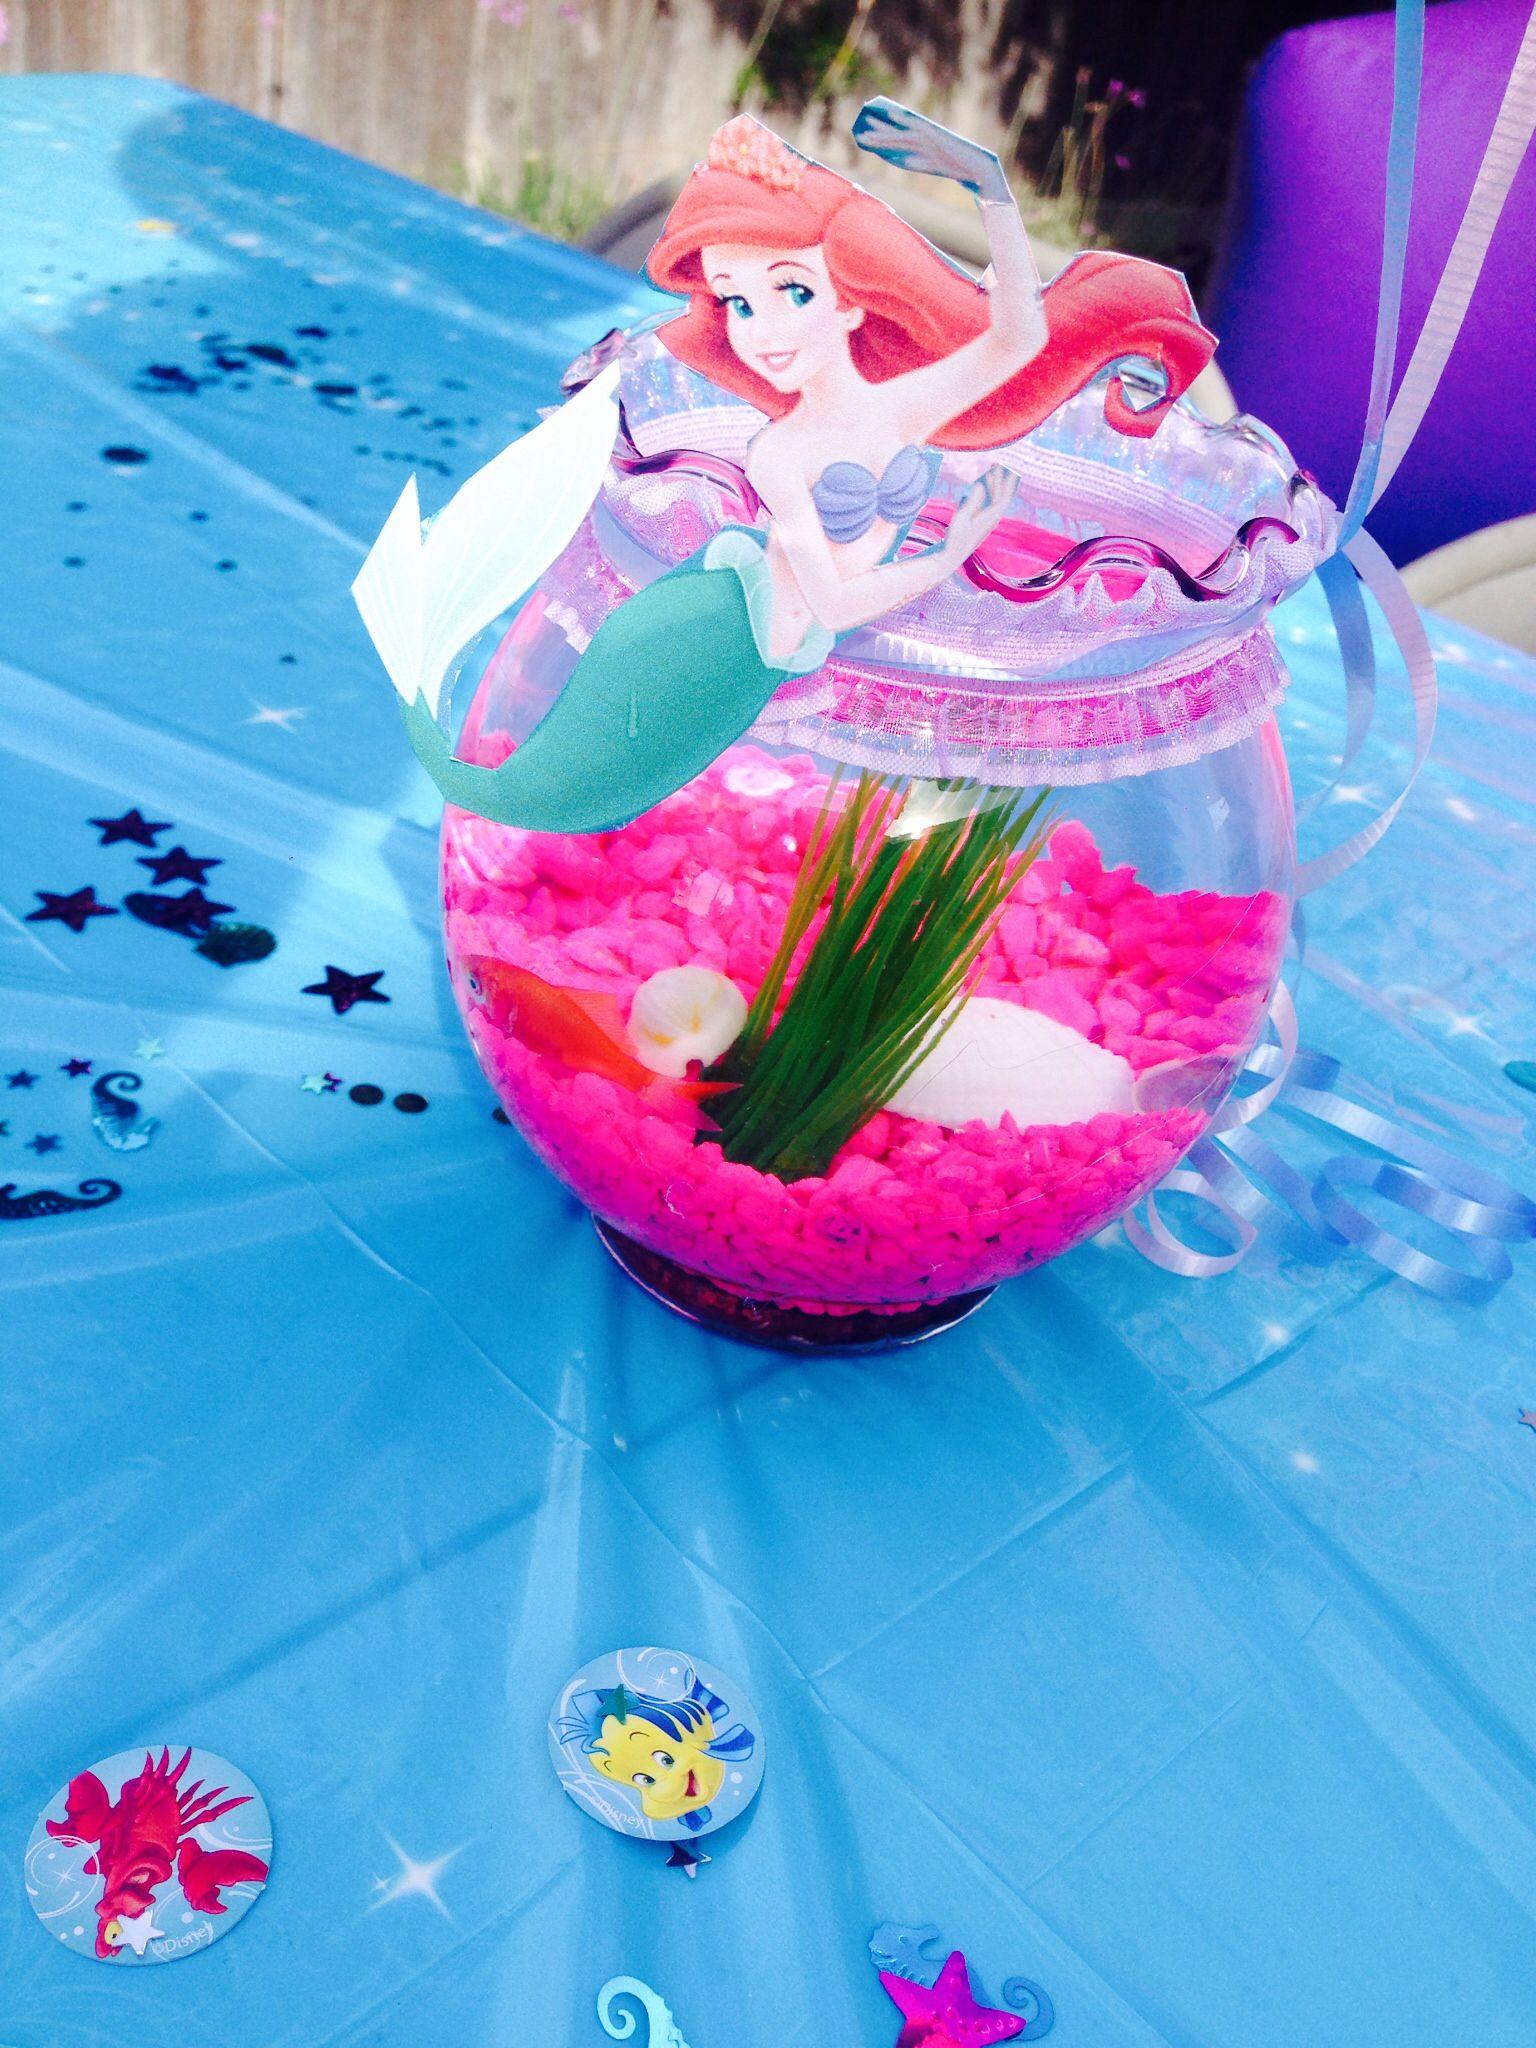 Little Mermaid Party Centerpiece Ideas  Little Mermaid fishbowl centerpieces